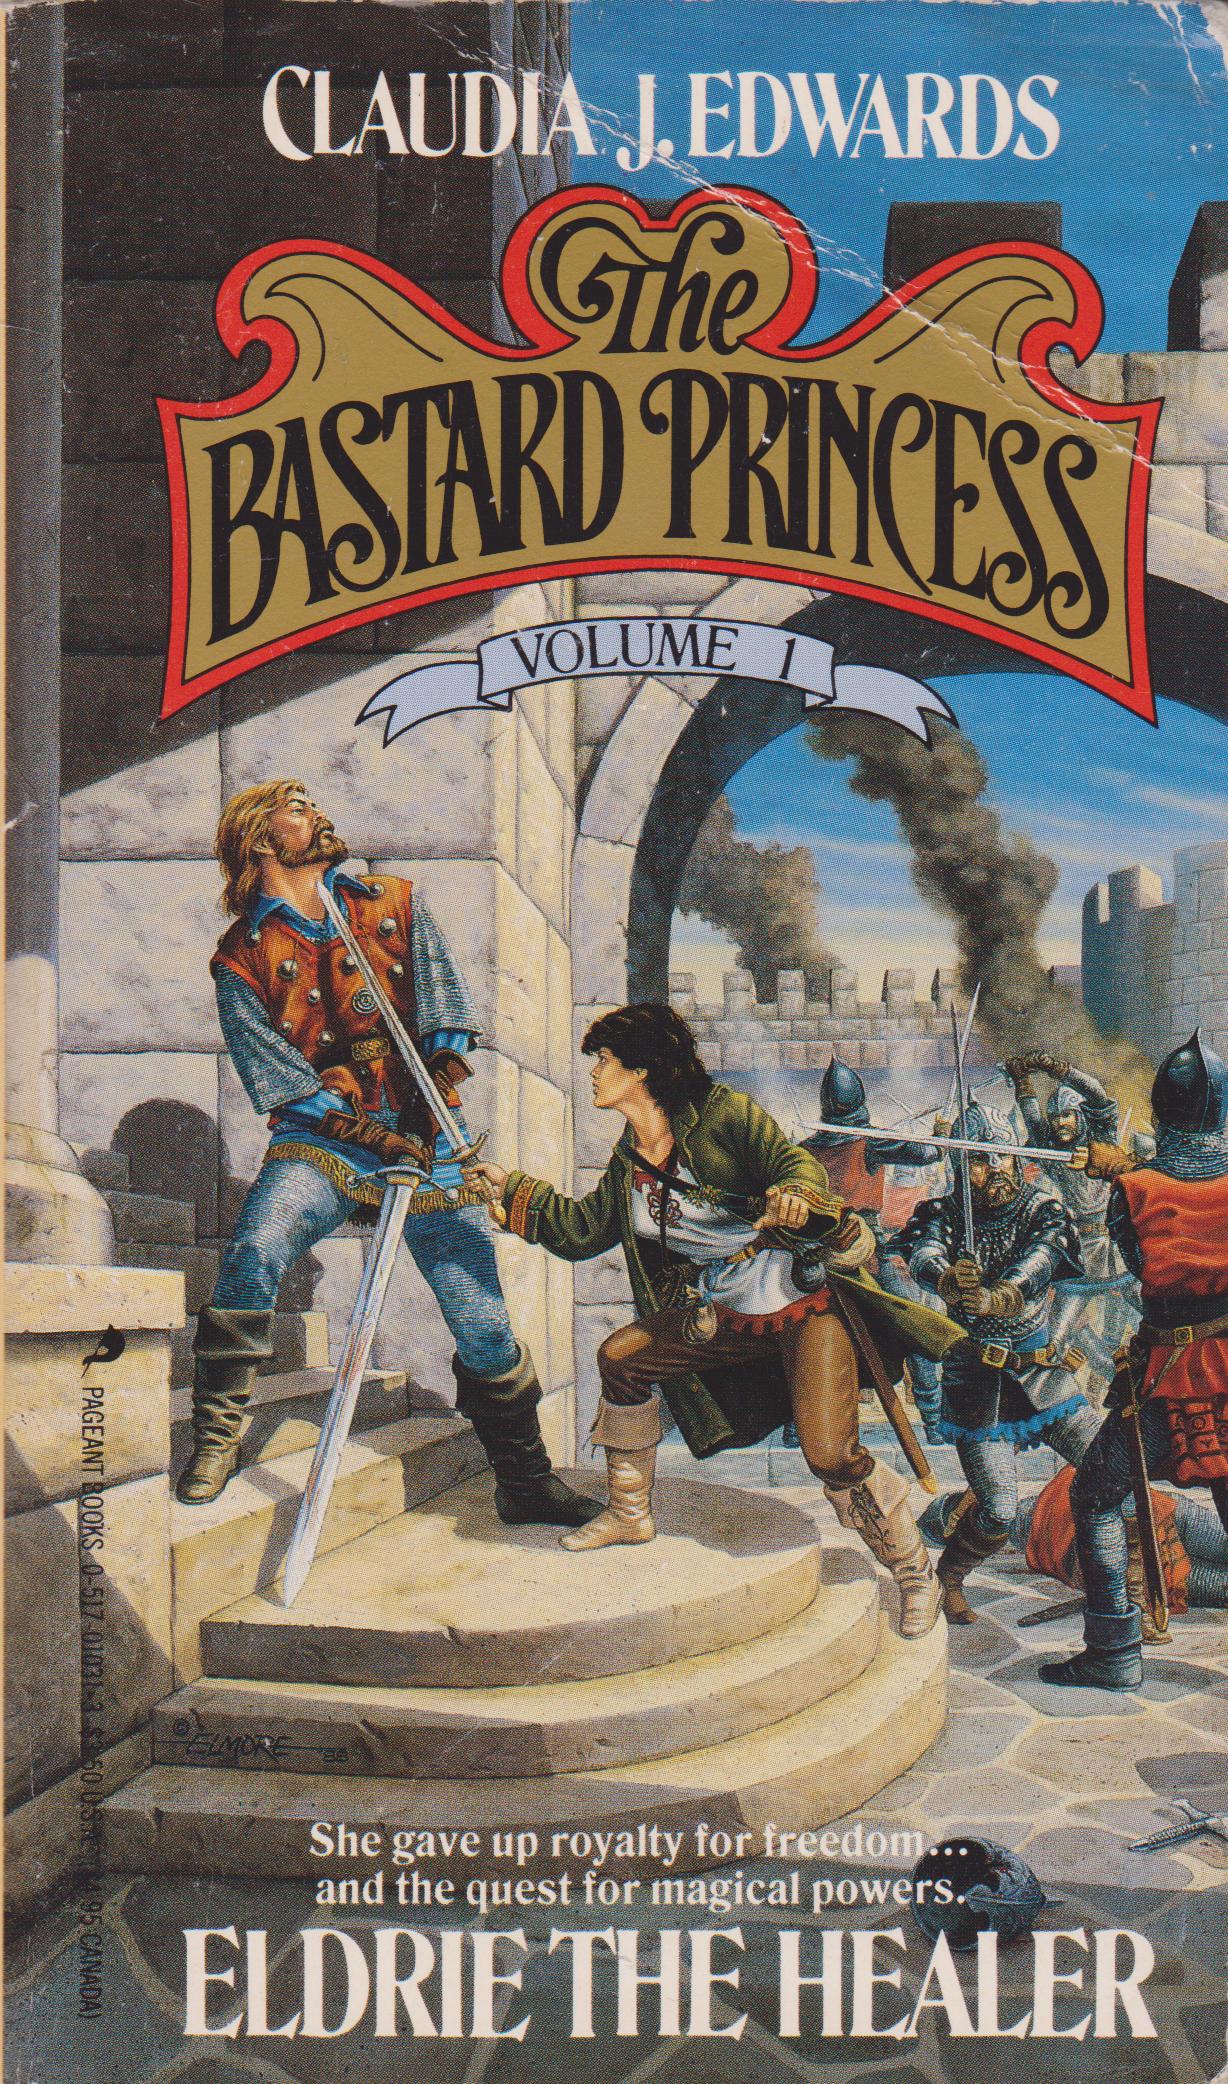 The Bastard Princess by Claudia J Edwards-front.png